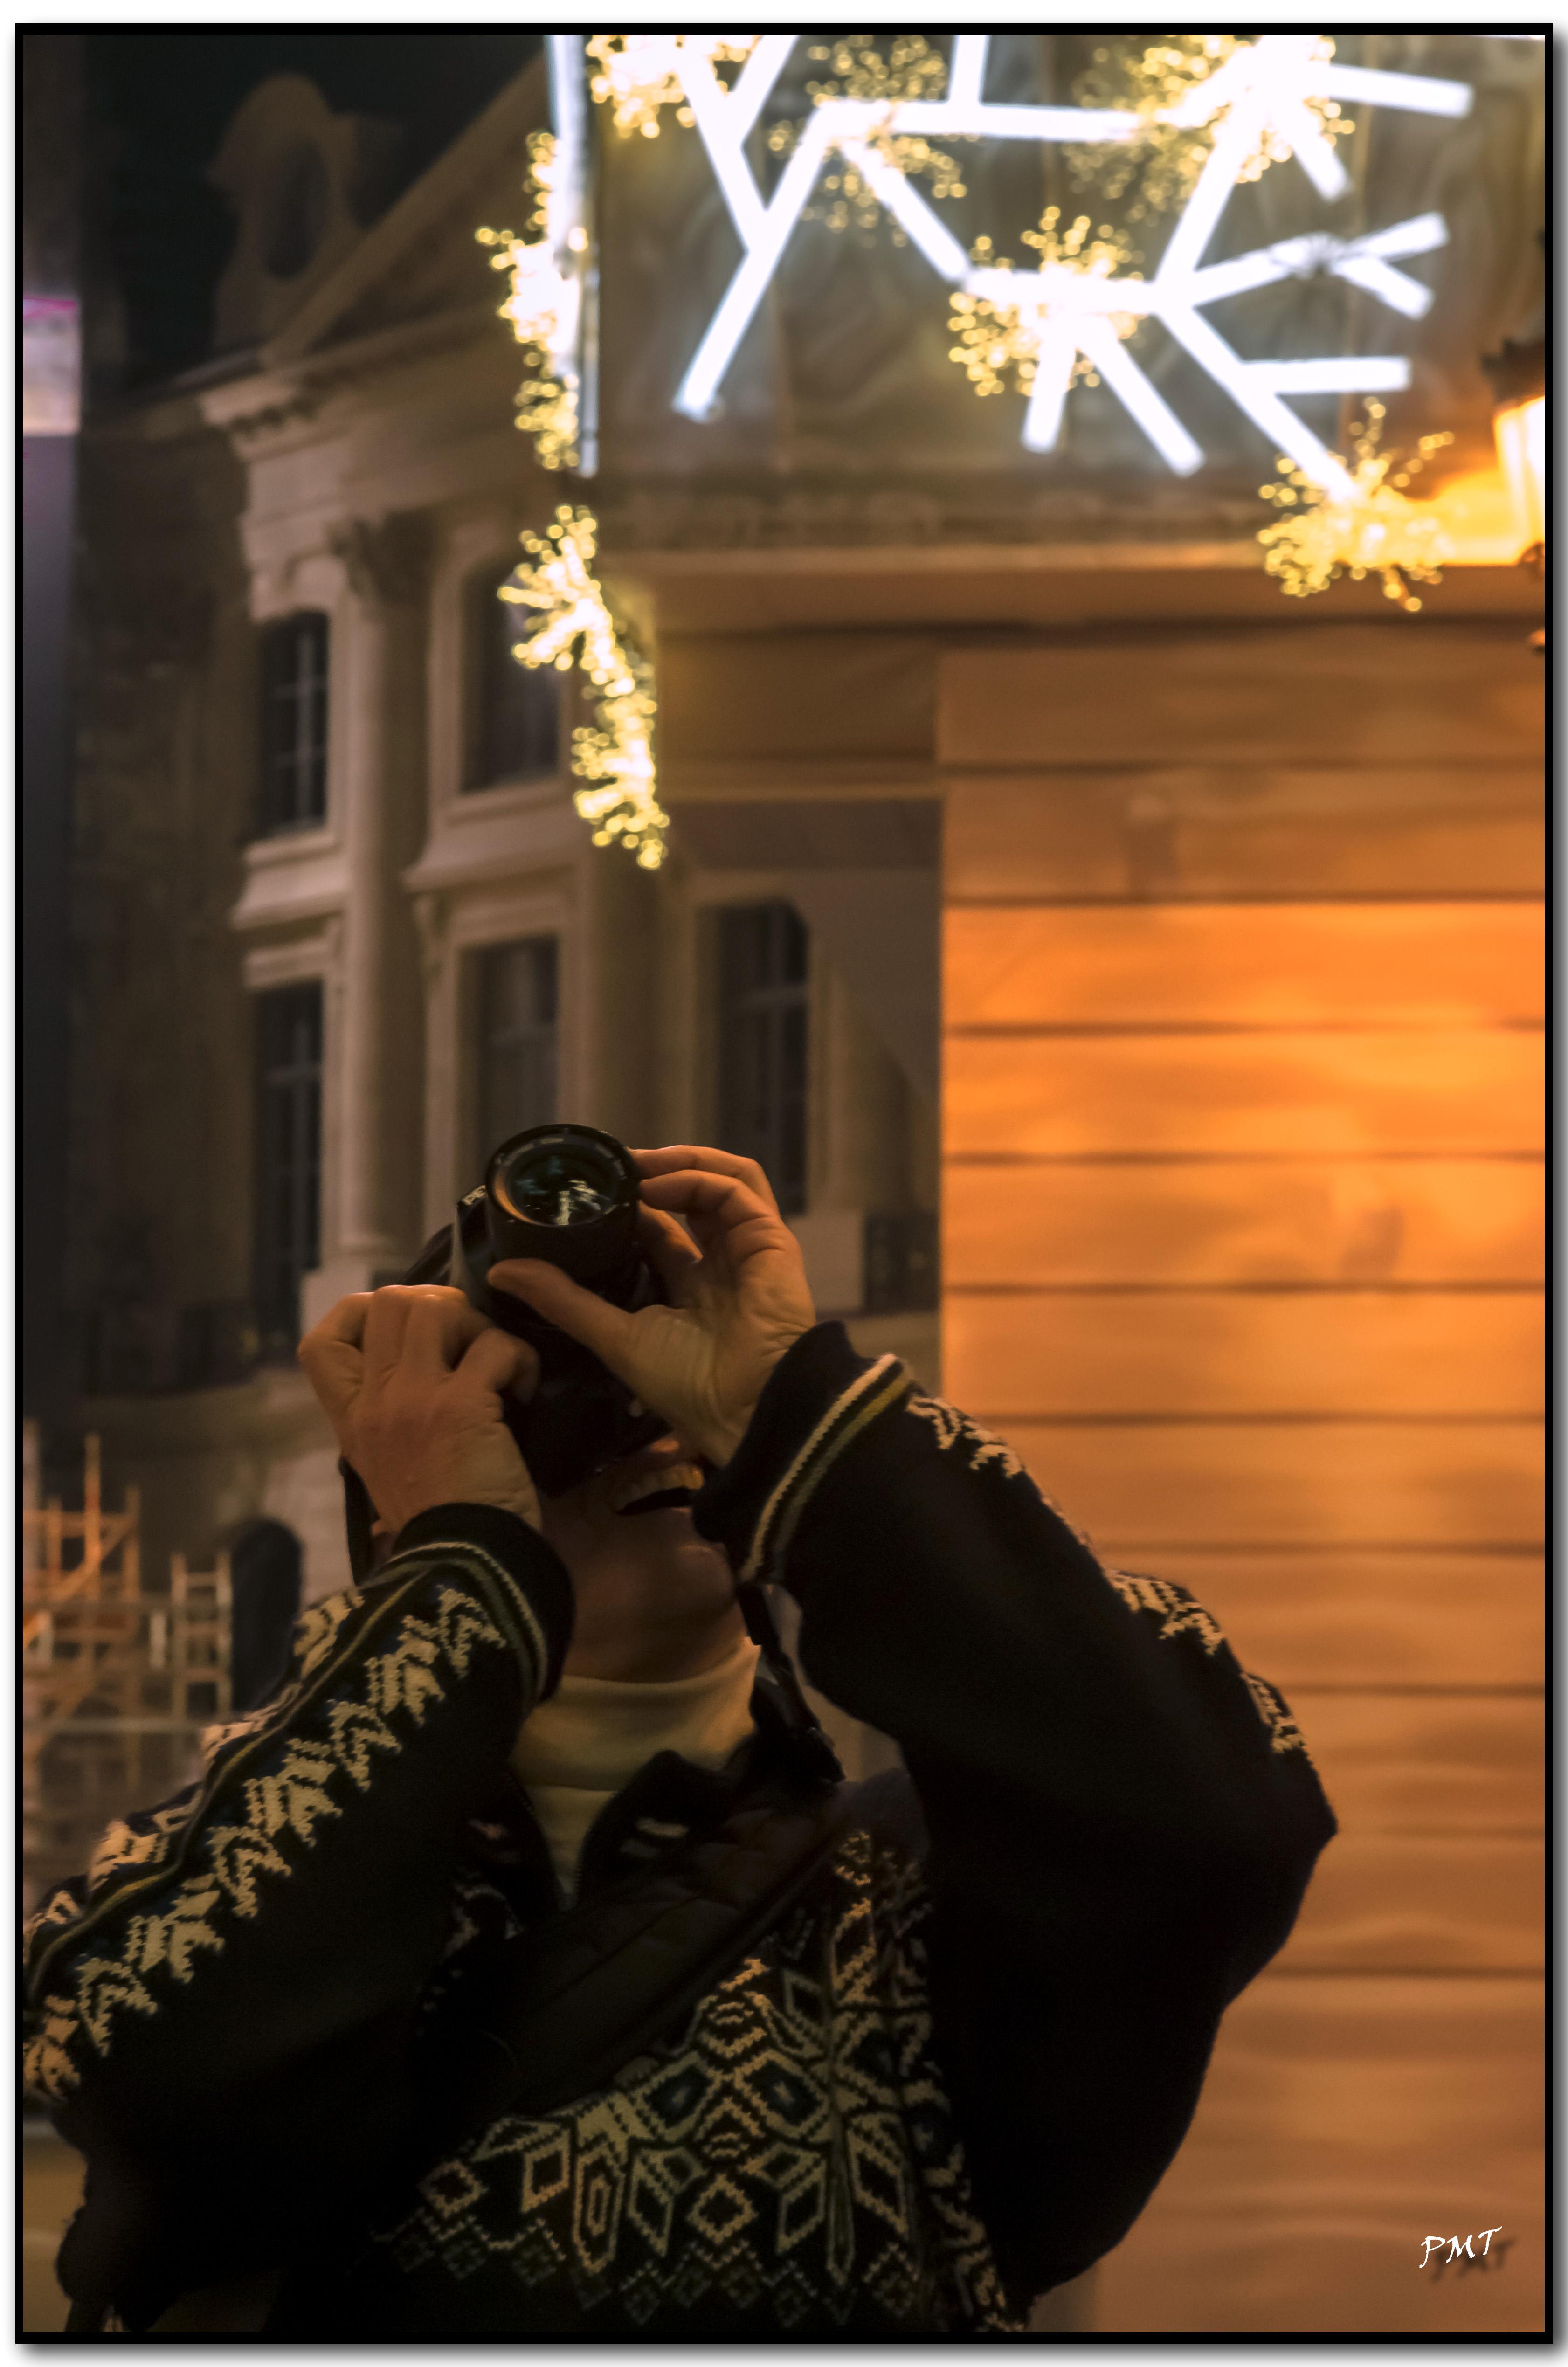 Illuminations de noël - sortie Paris du 30/11 - Page 12 Sortei30118